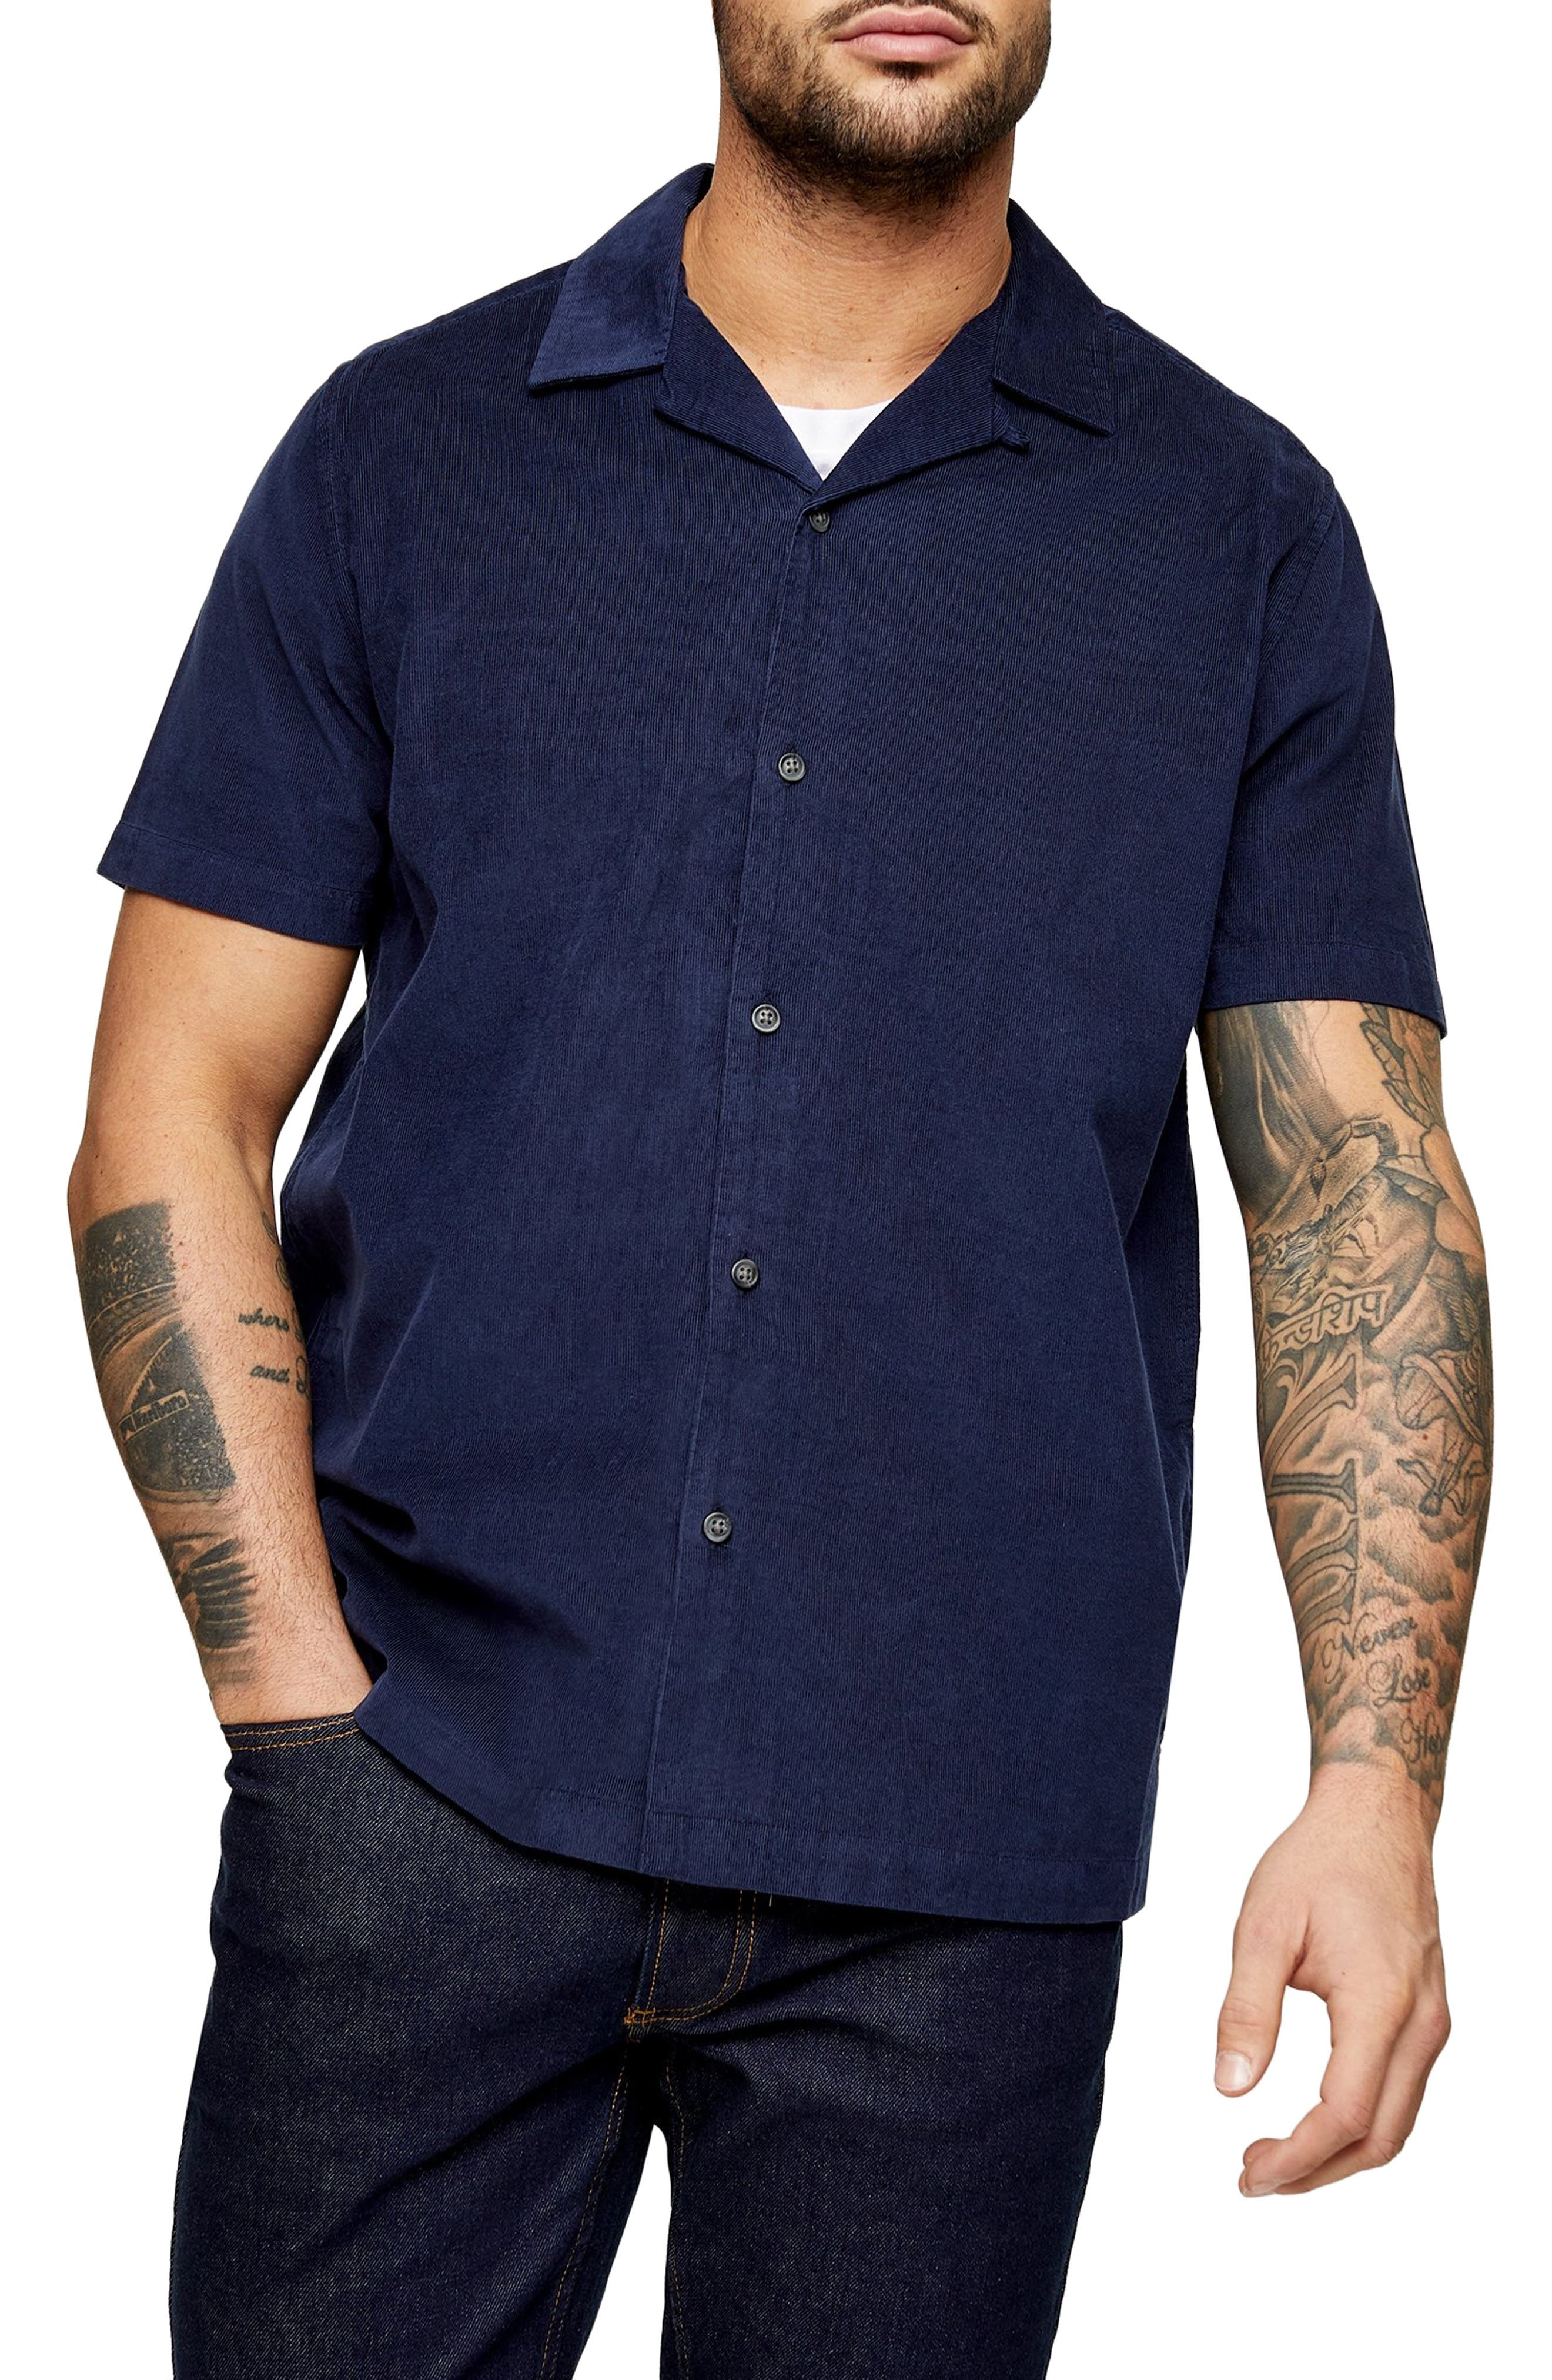 Mens Vintage Shirts – Retro Shirts Mens Topman Short Sleeve Button-Up Corduroy Camp Shirt $27.00 AT vintagedancer.com